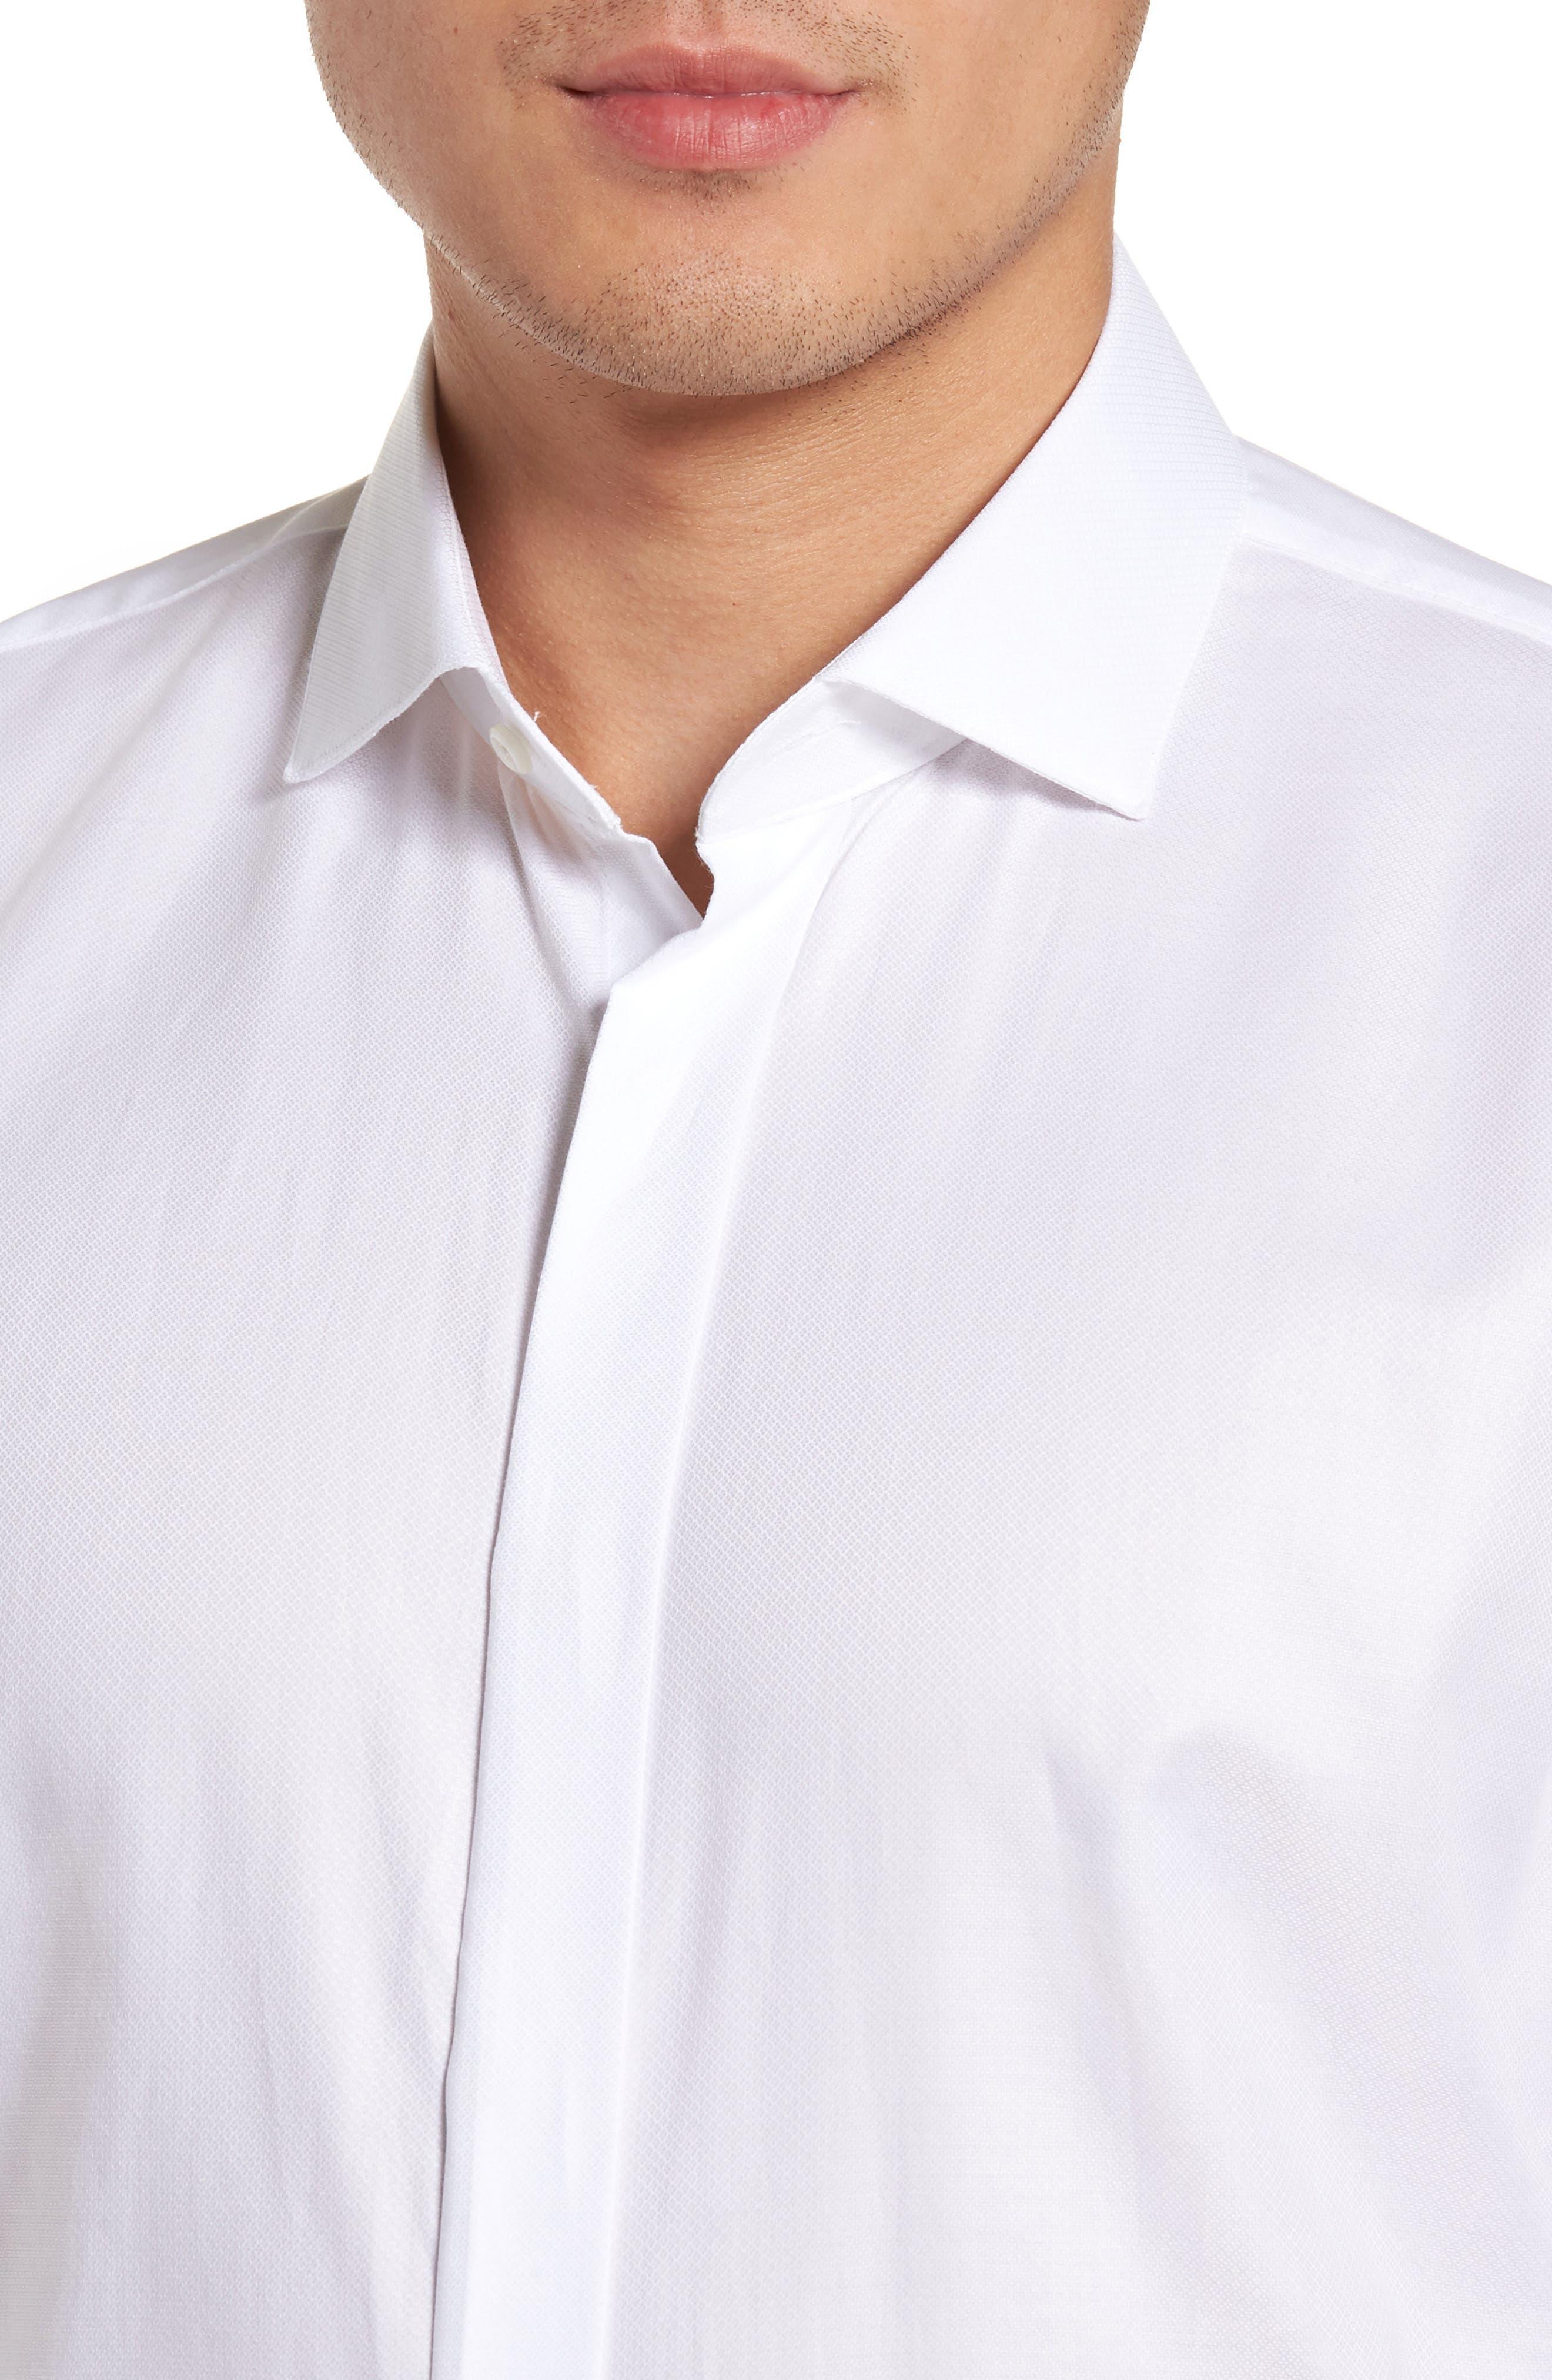 Trim Fit Tuxedo Shirt,                             Alternate thumbnail 4, color,                             White